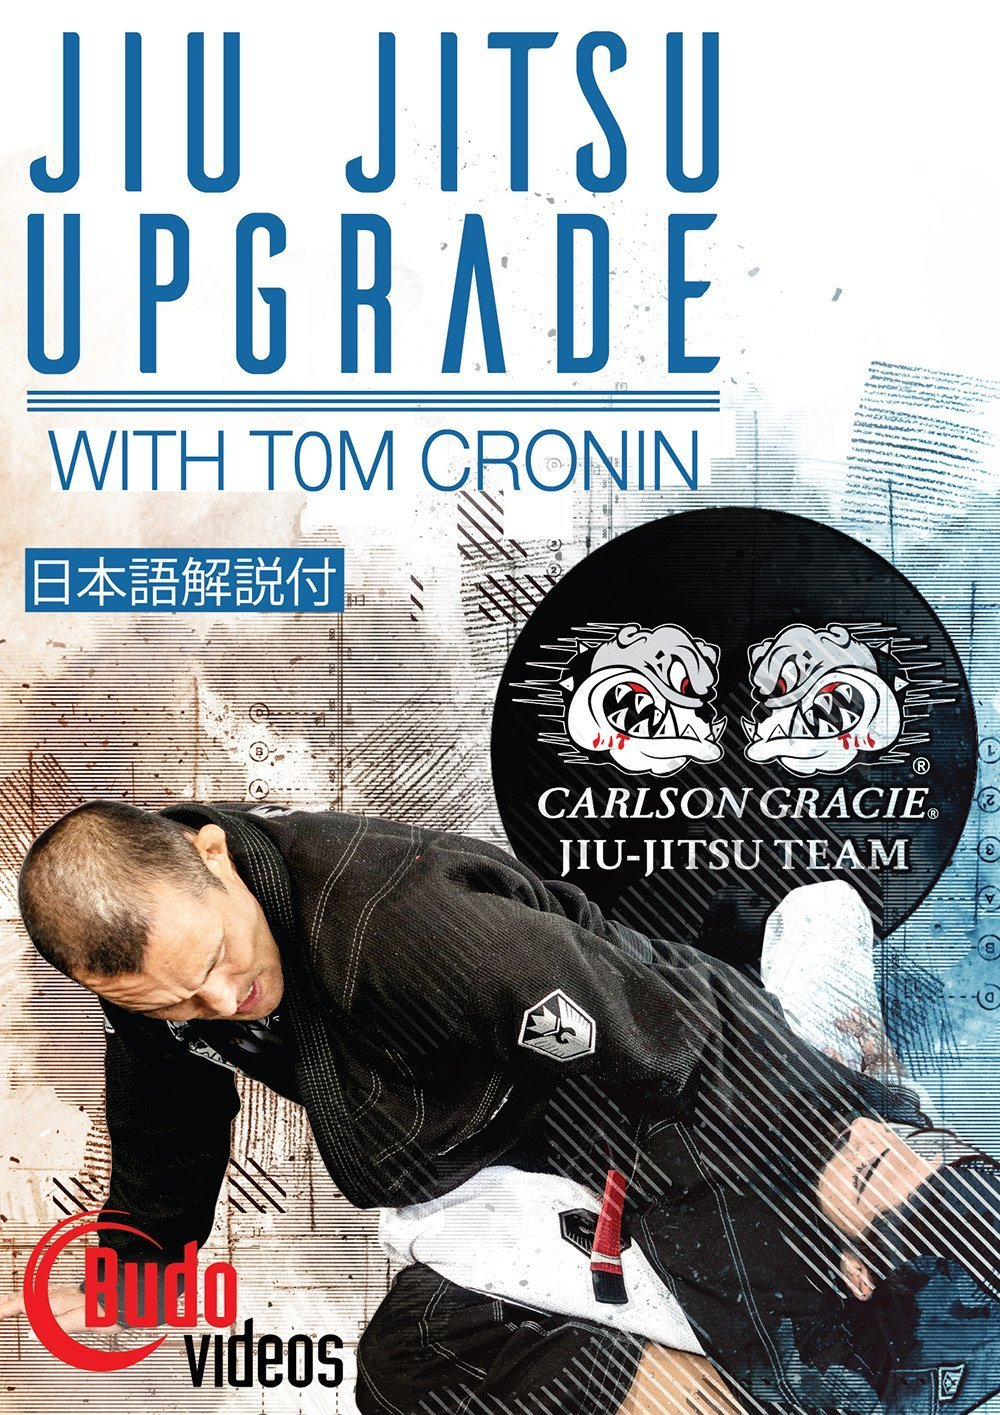 【DVD】日本語吹き替え付き トム・クローニン 柔術アップグレード|ブラジリアン柔術テクニック教則